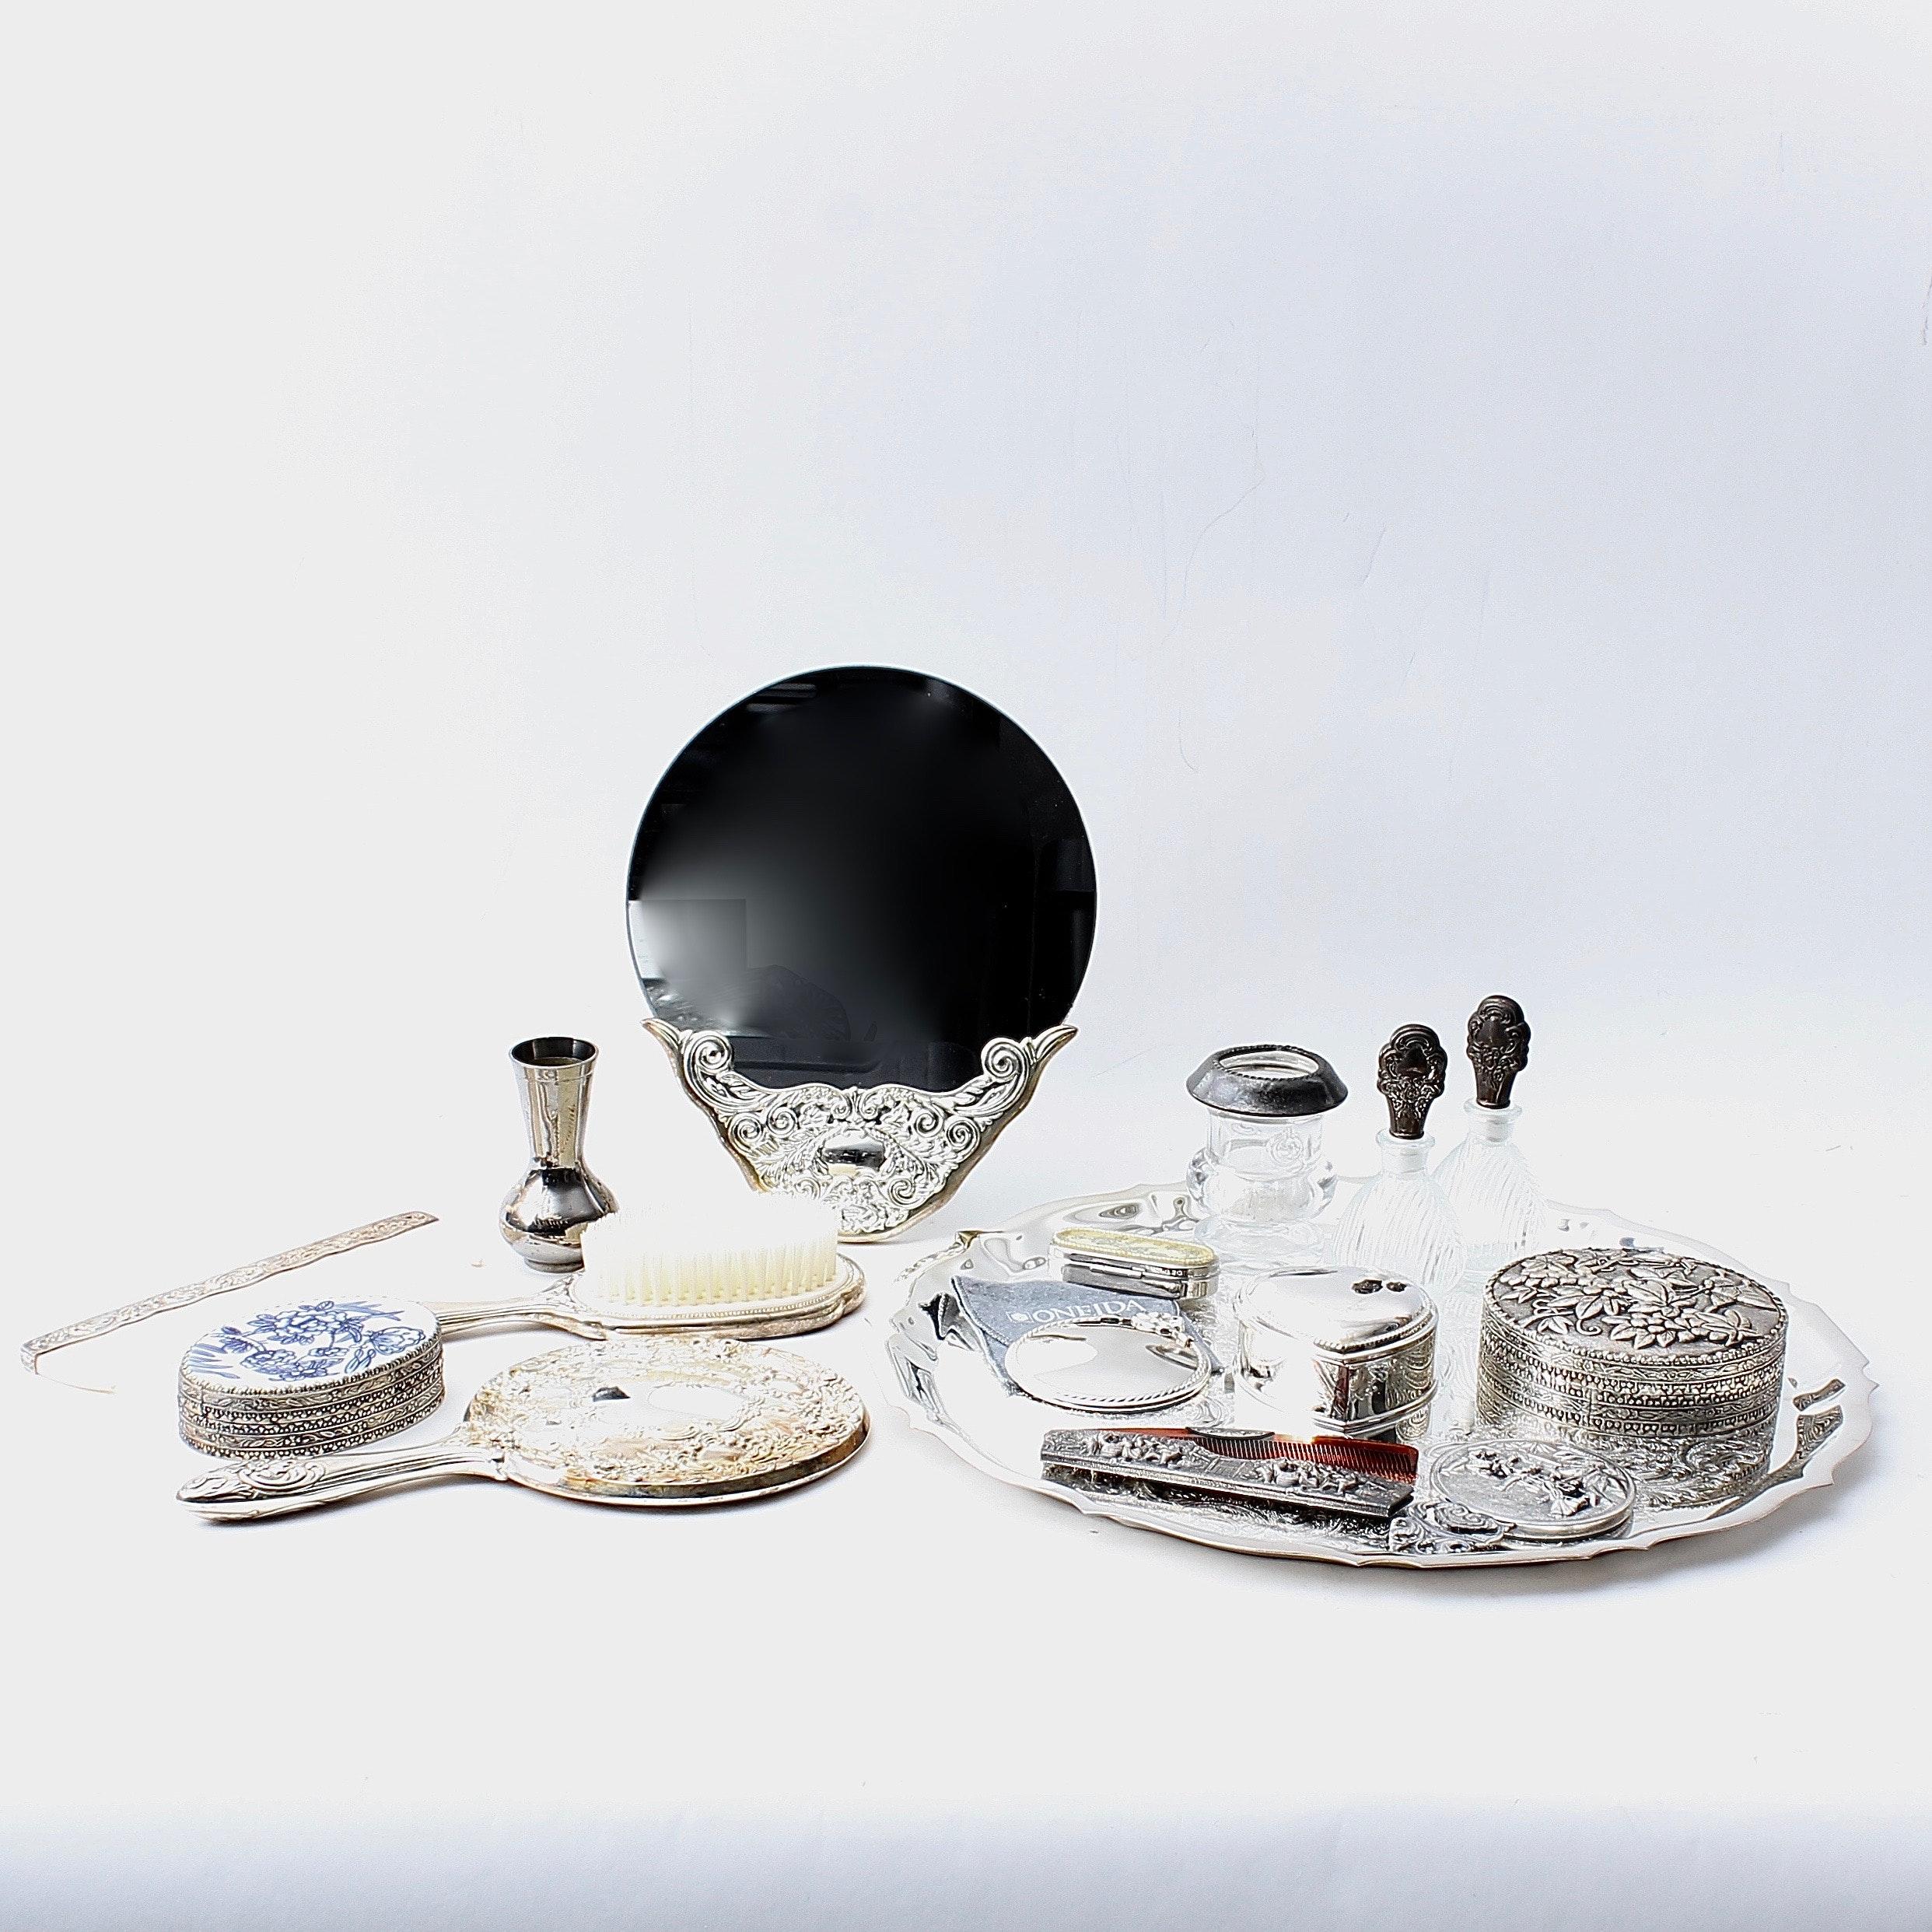 Silver Tone Vanity Accessories